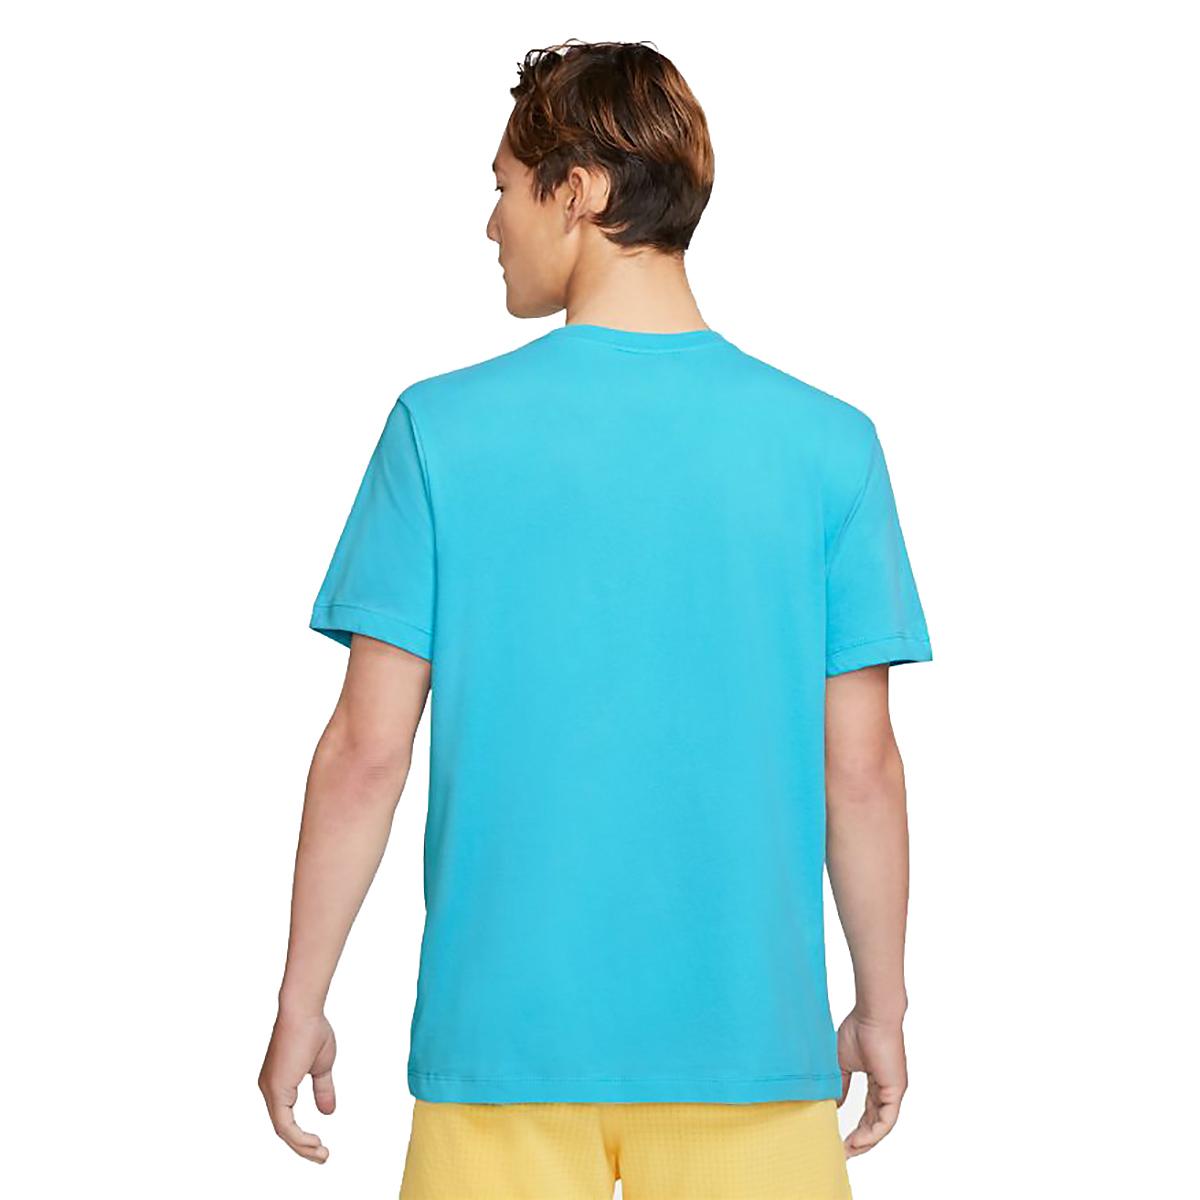 Men's Nike Dri-FIT Short-Sleeve Trail Running T-Shirt - Color: Chlorine Blue - Size: XS, Chlorine Blue, large, image 2